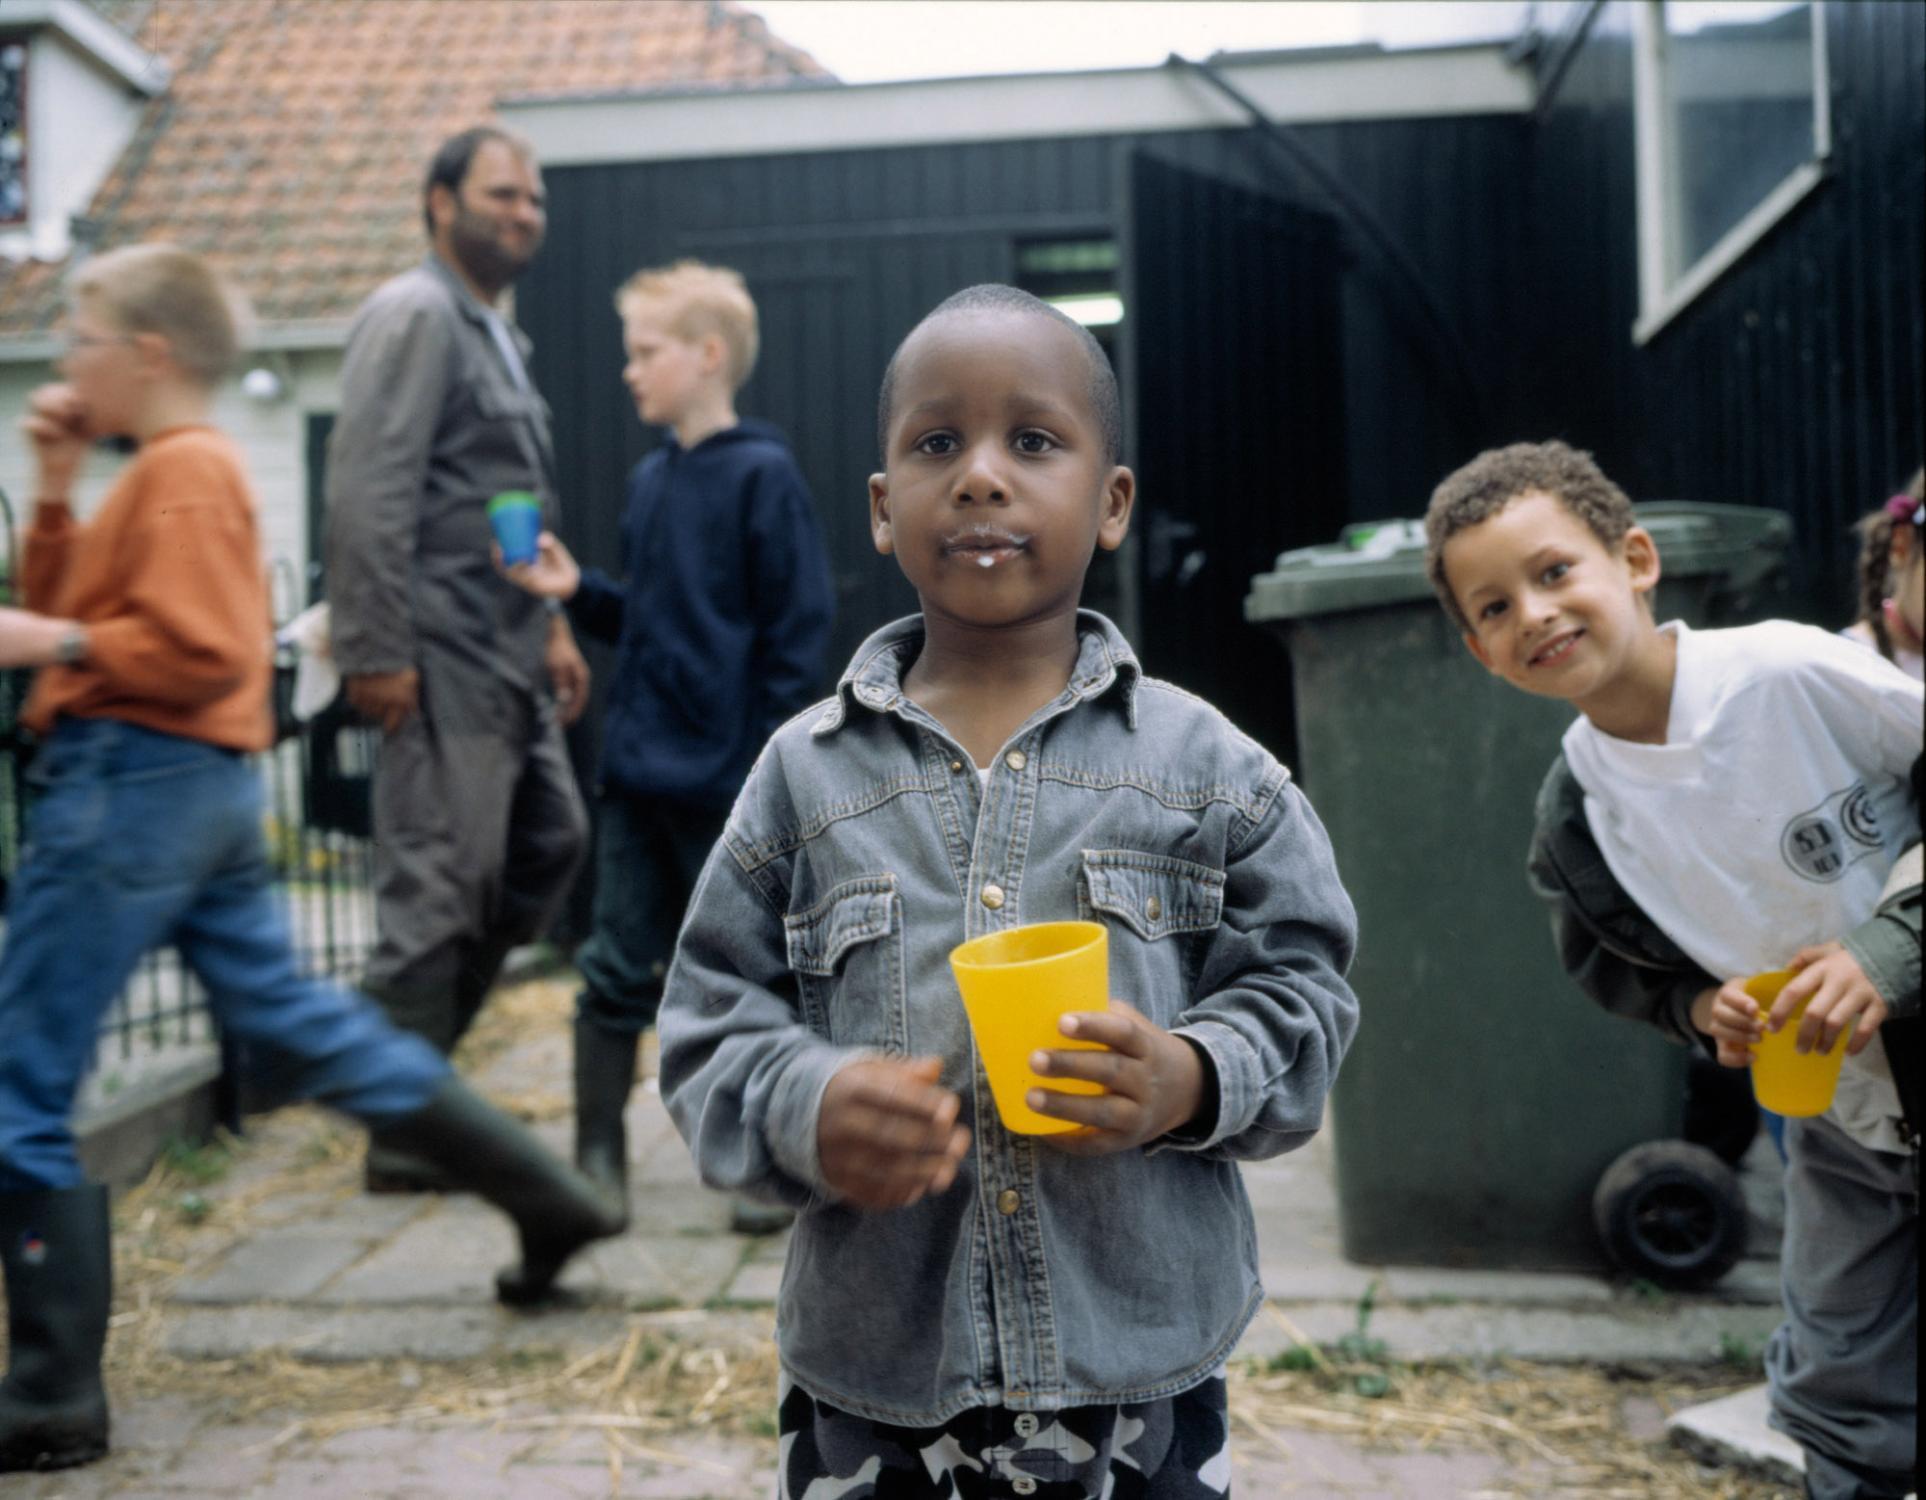 Fresh cow's milk. Zunderdorp, Noord-Holland, The Netherlands. May 1999.